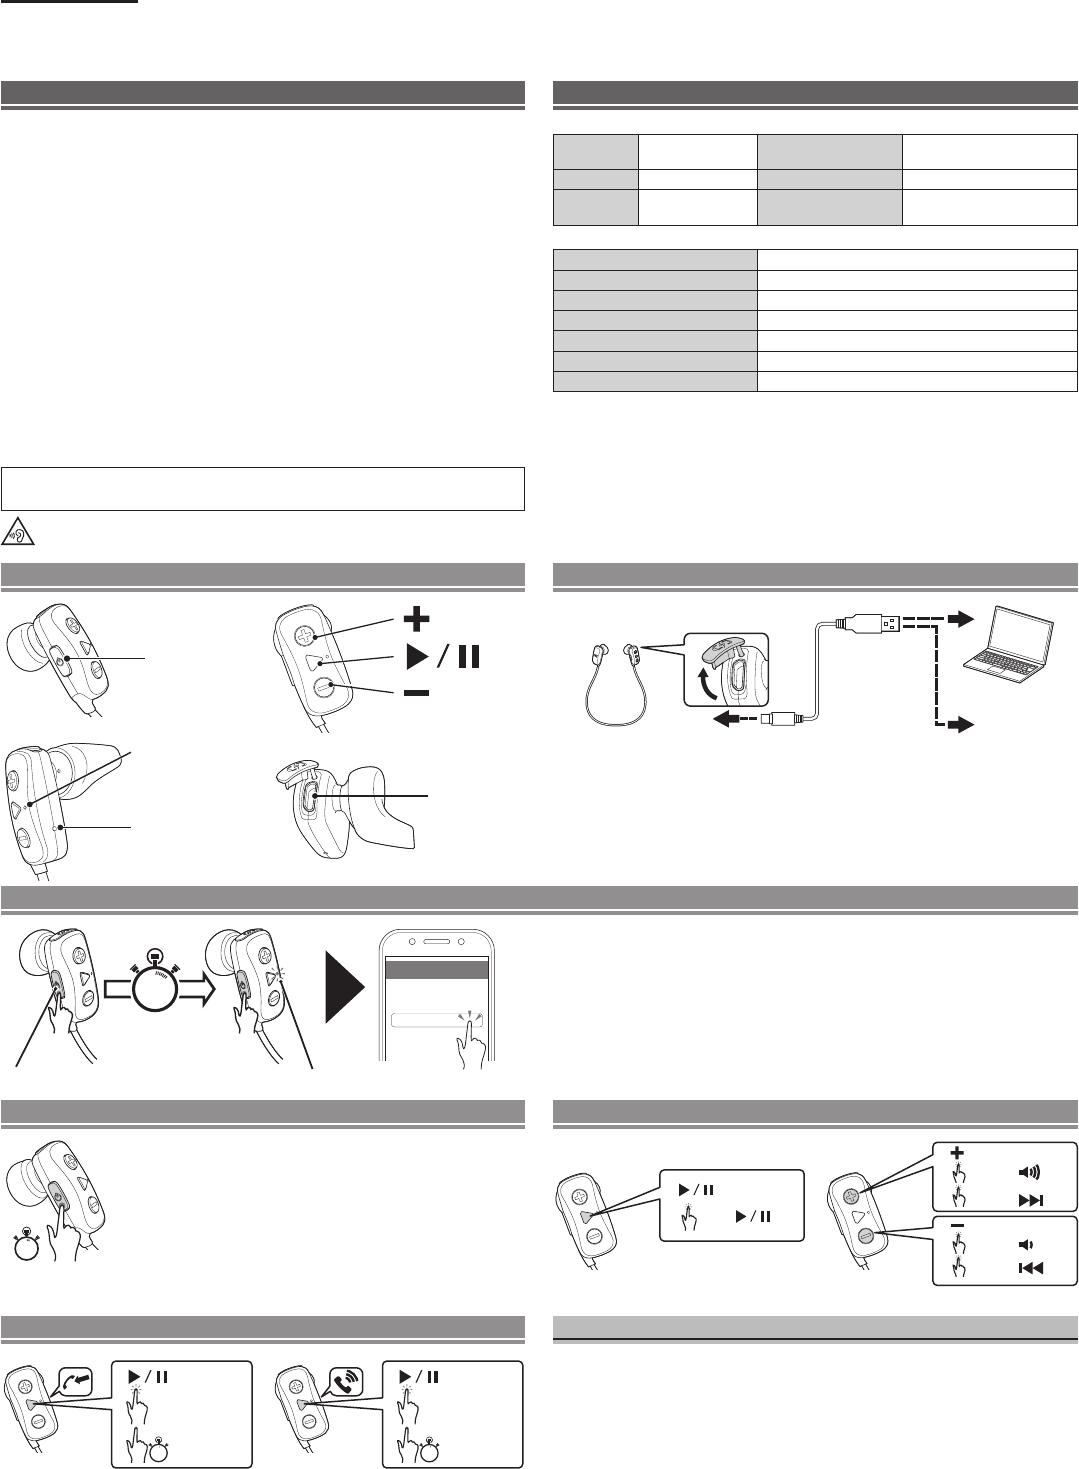 niedlich geschirrsp ler schaltplan galerie der schaltplan. Black Bedroom Furniture Sets. Home Design Ideas